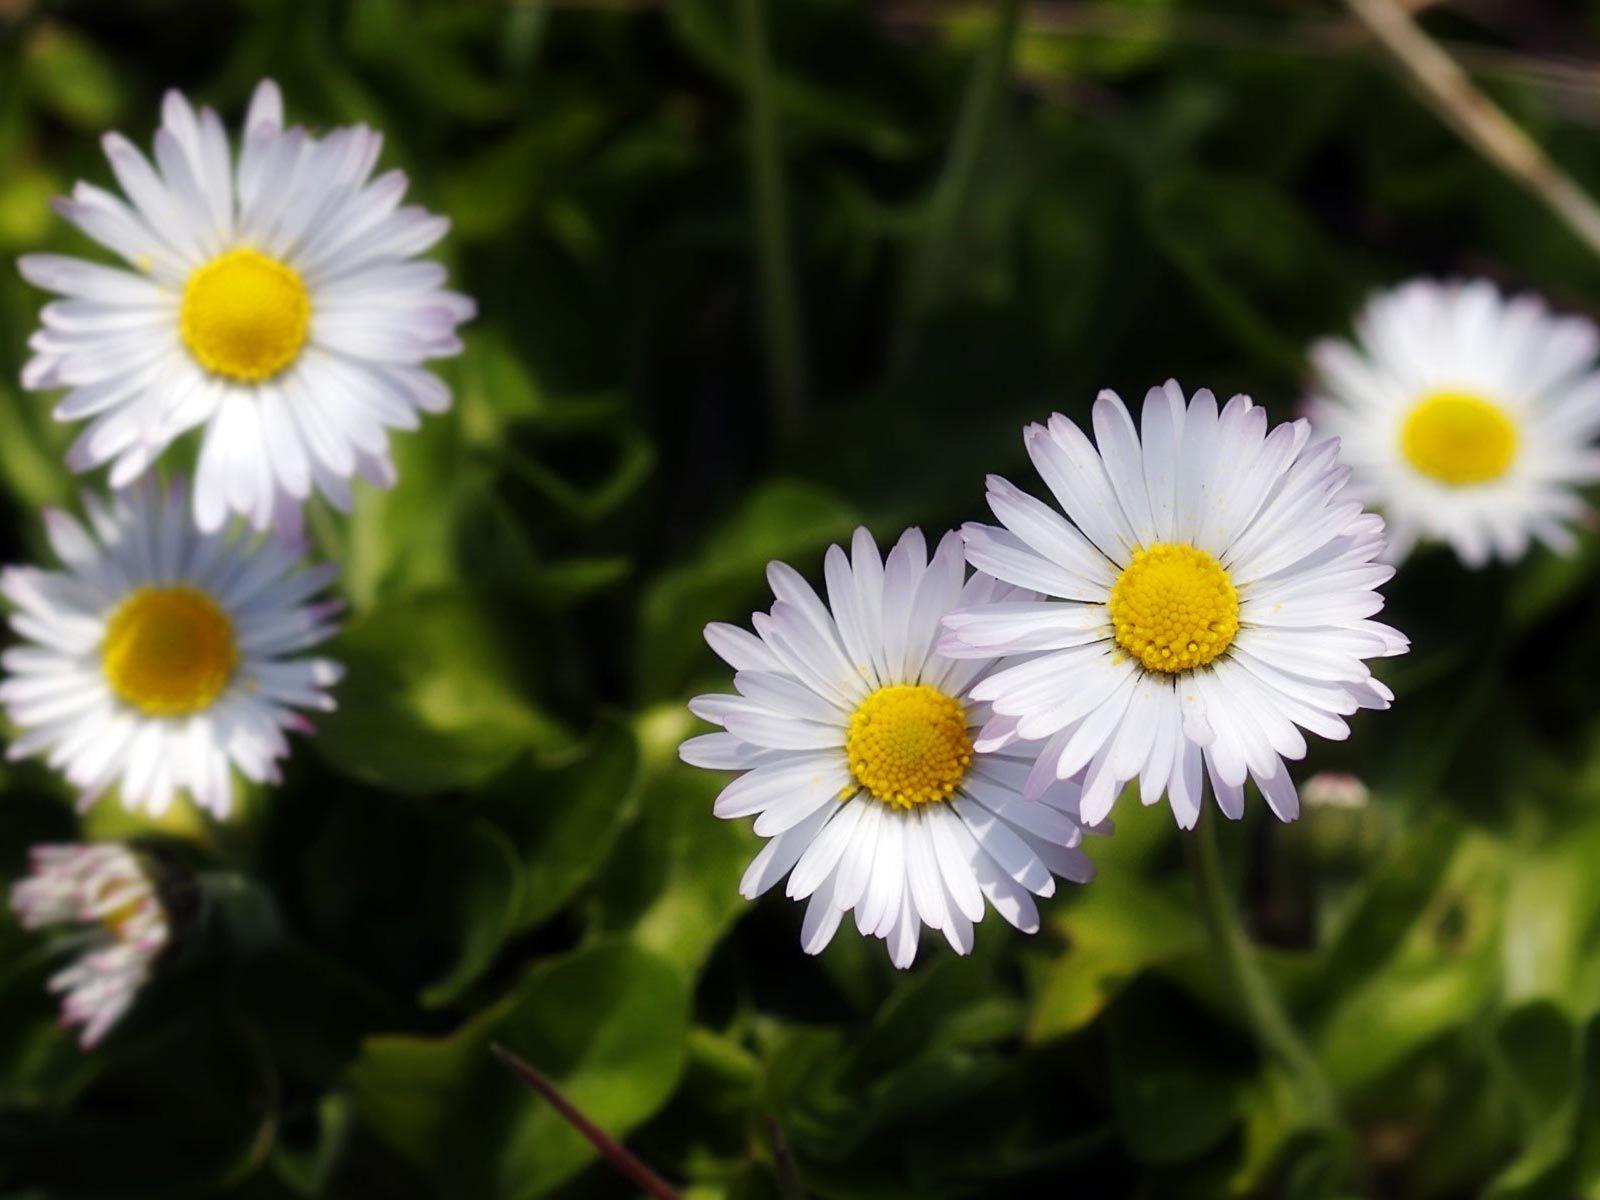 Background Meadow Daisy Flower Desktops Daisies Images Garden